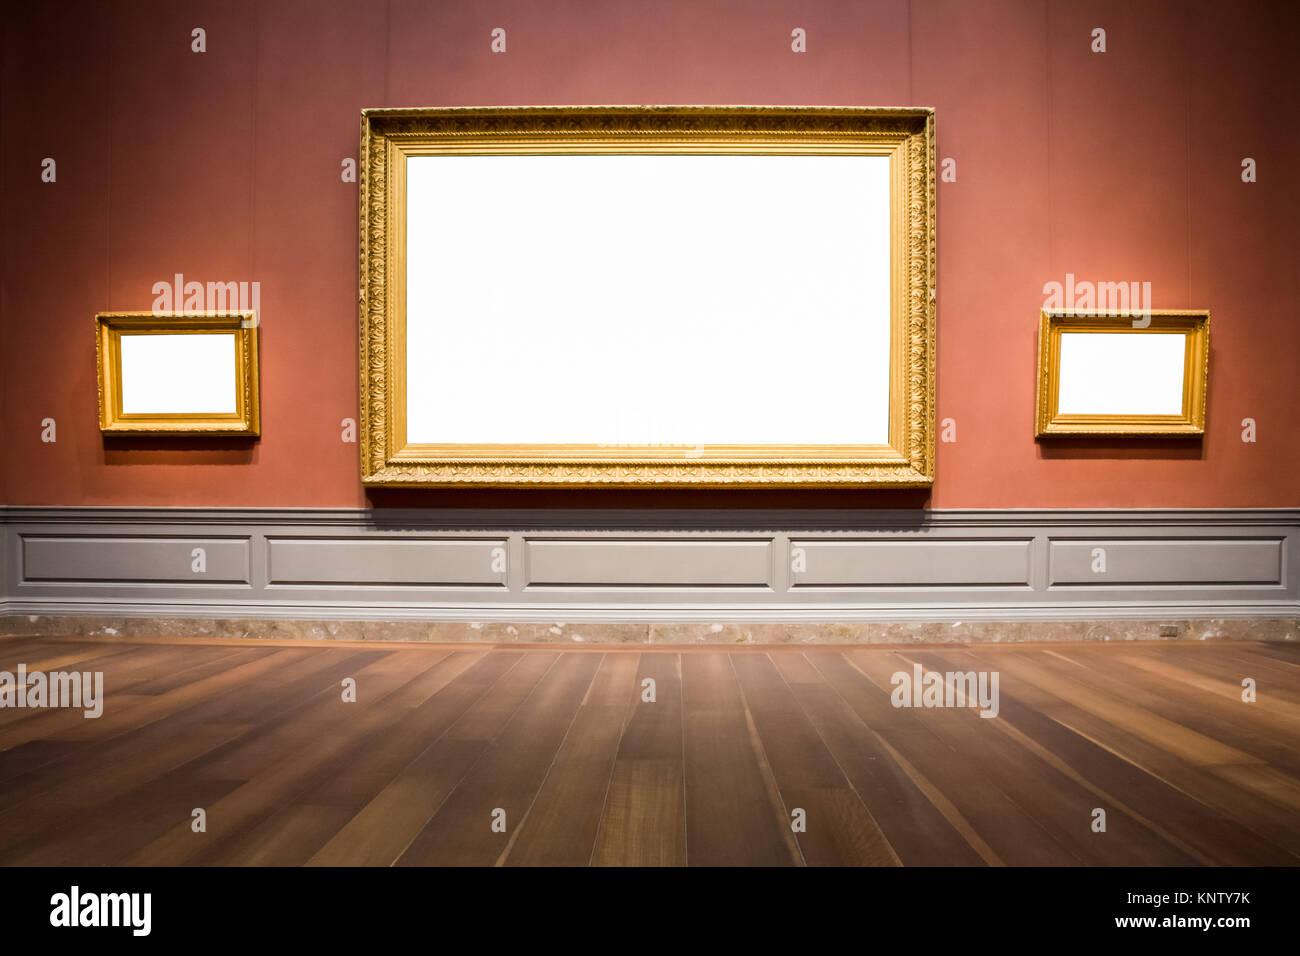 Drei verzierten Bilderrahmen Art Gallery Museum Ausstellung leere ...